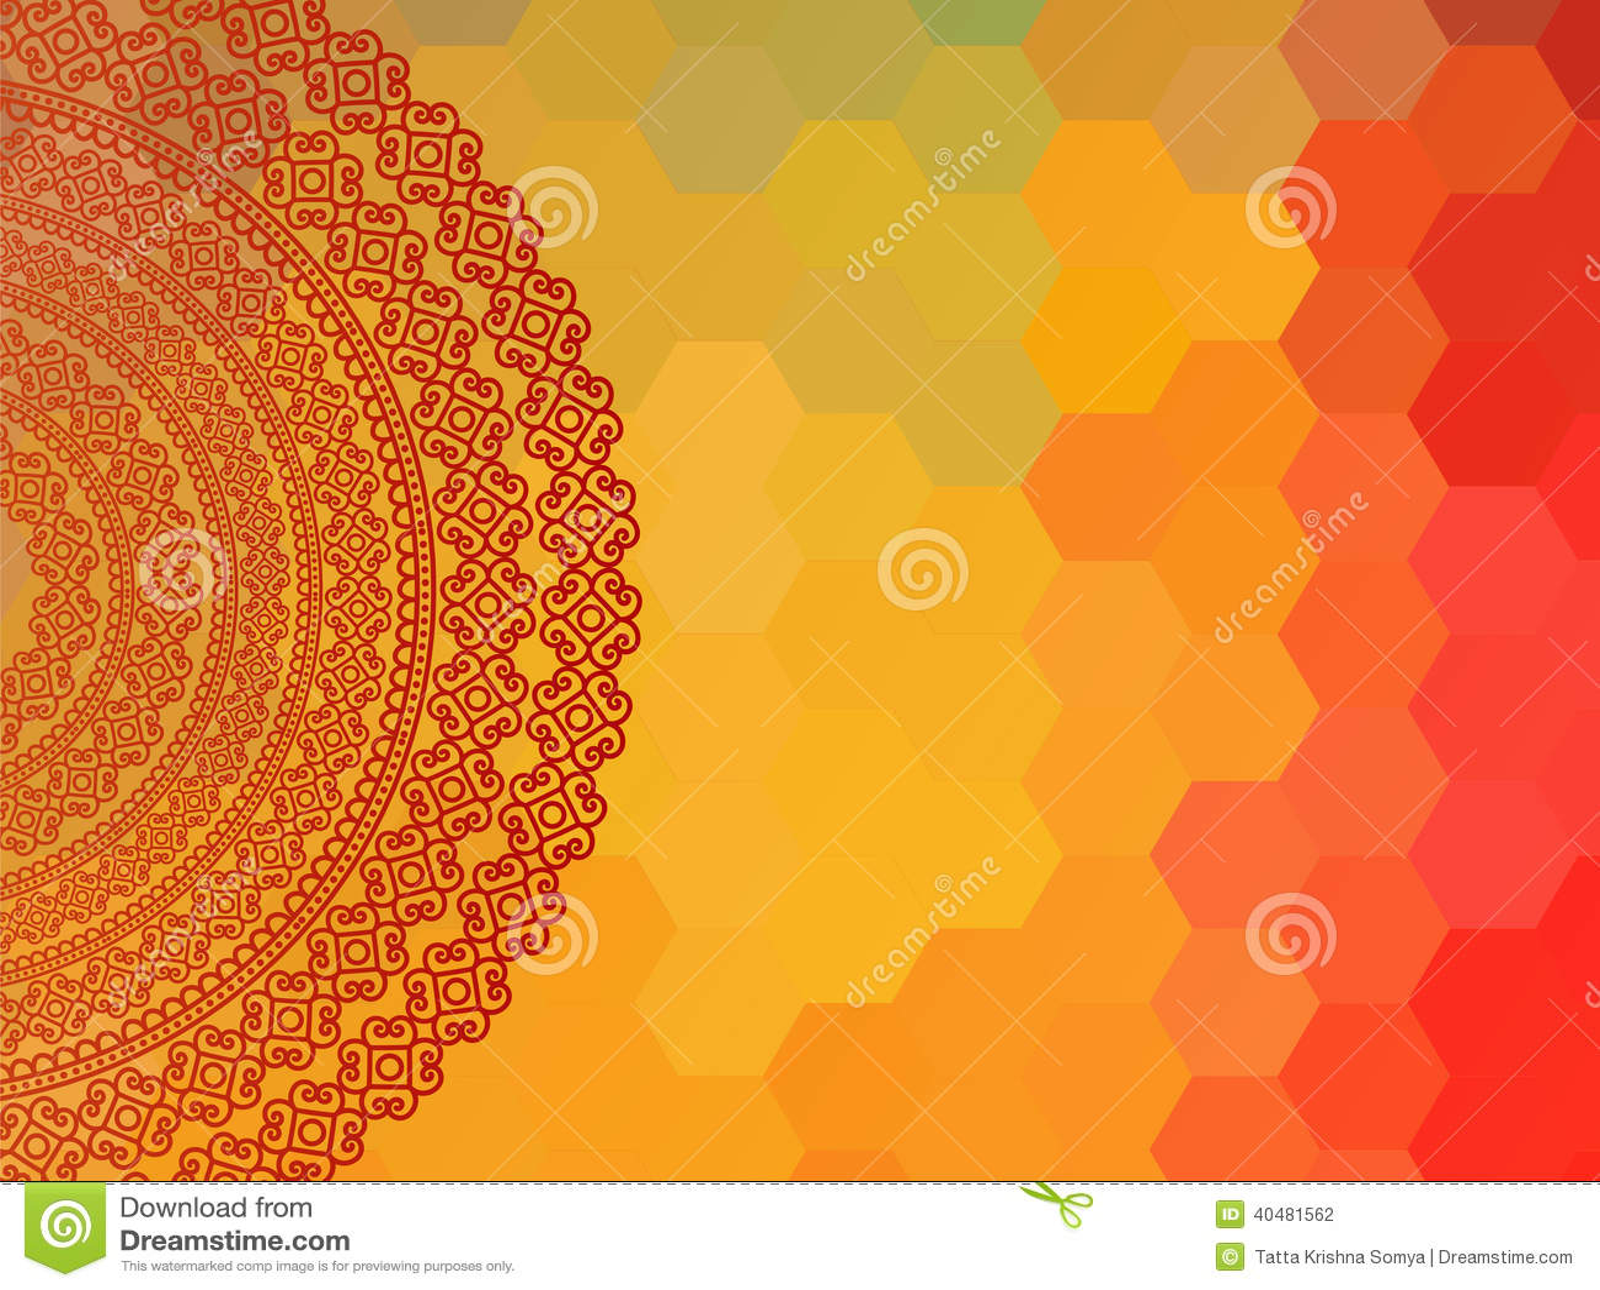 Colour Henna Mandala Background Illustration 40481562 Megapixl